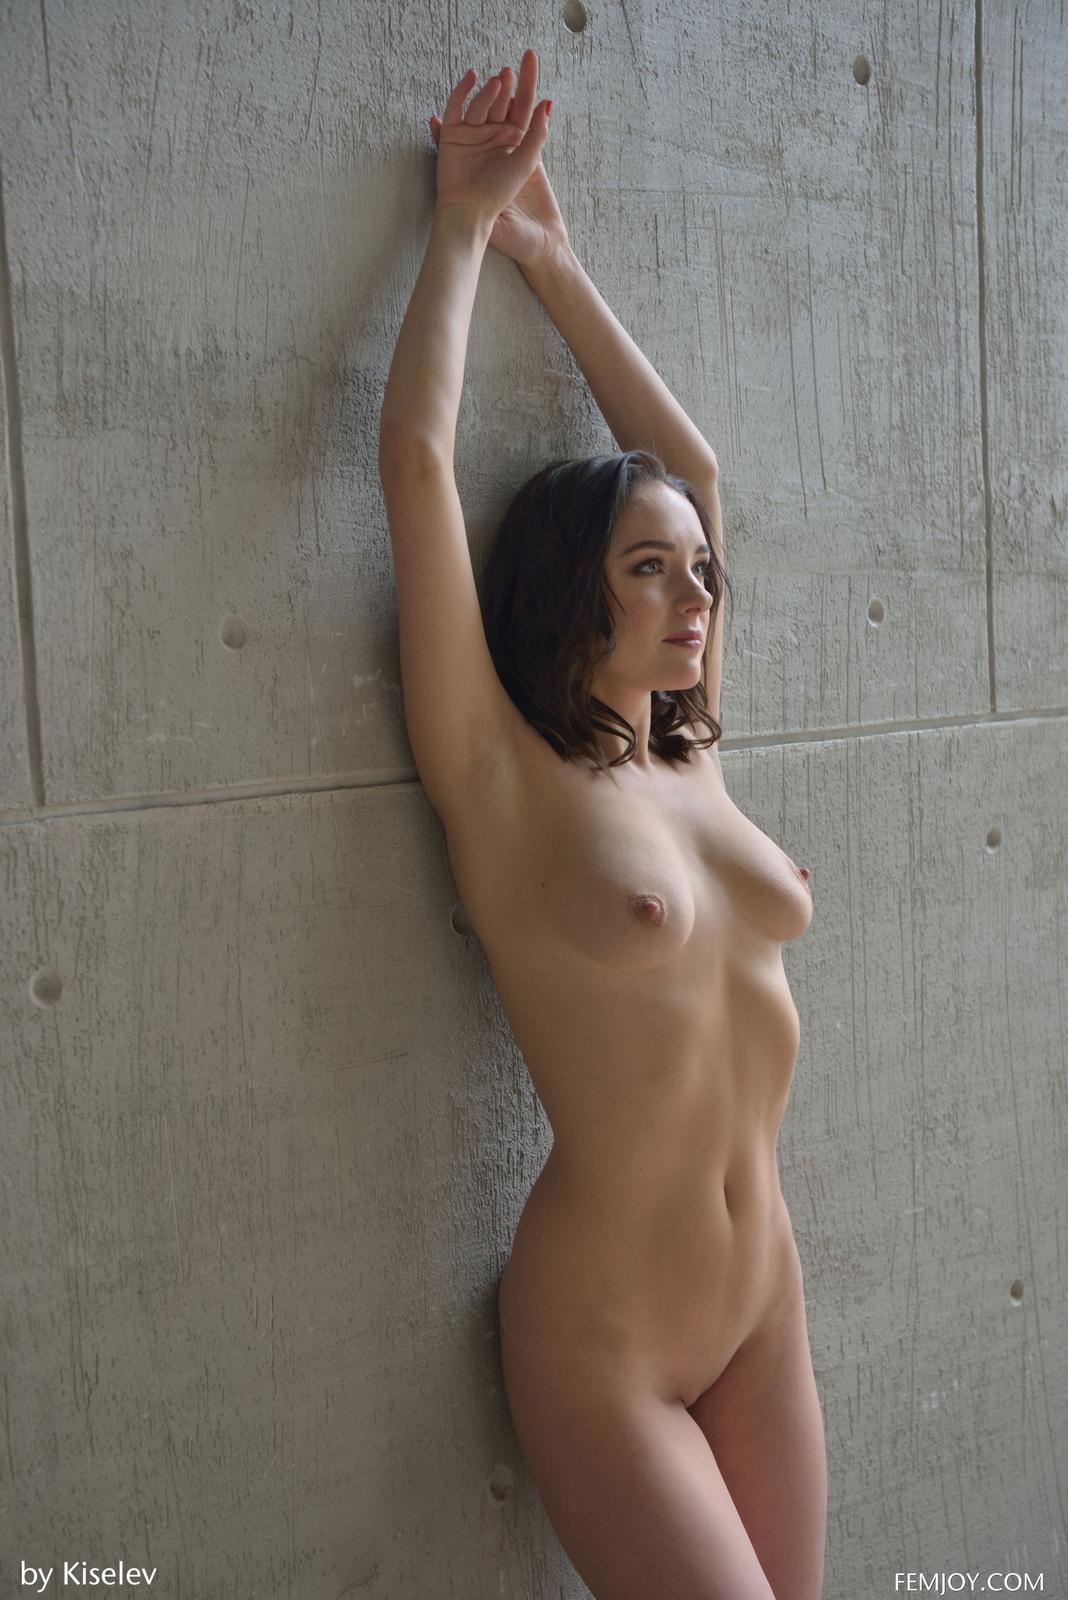 nika-a-naked-bottomless-grey-shirt-pussy-femjoy-35